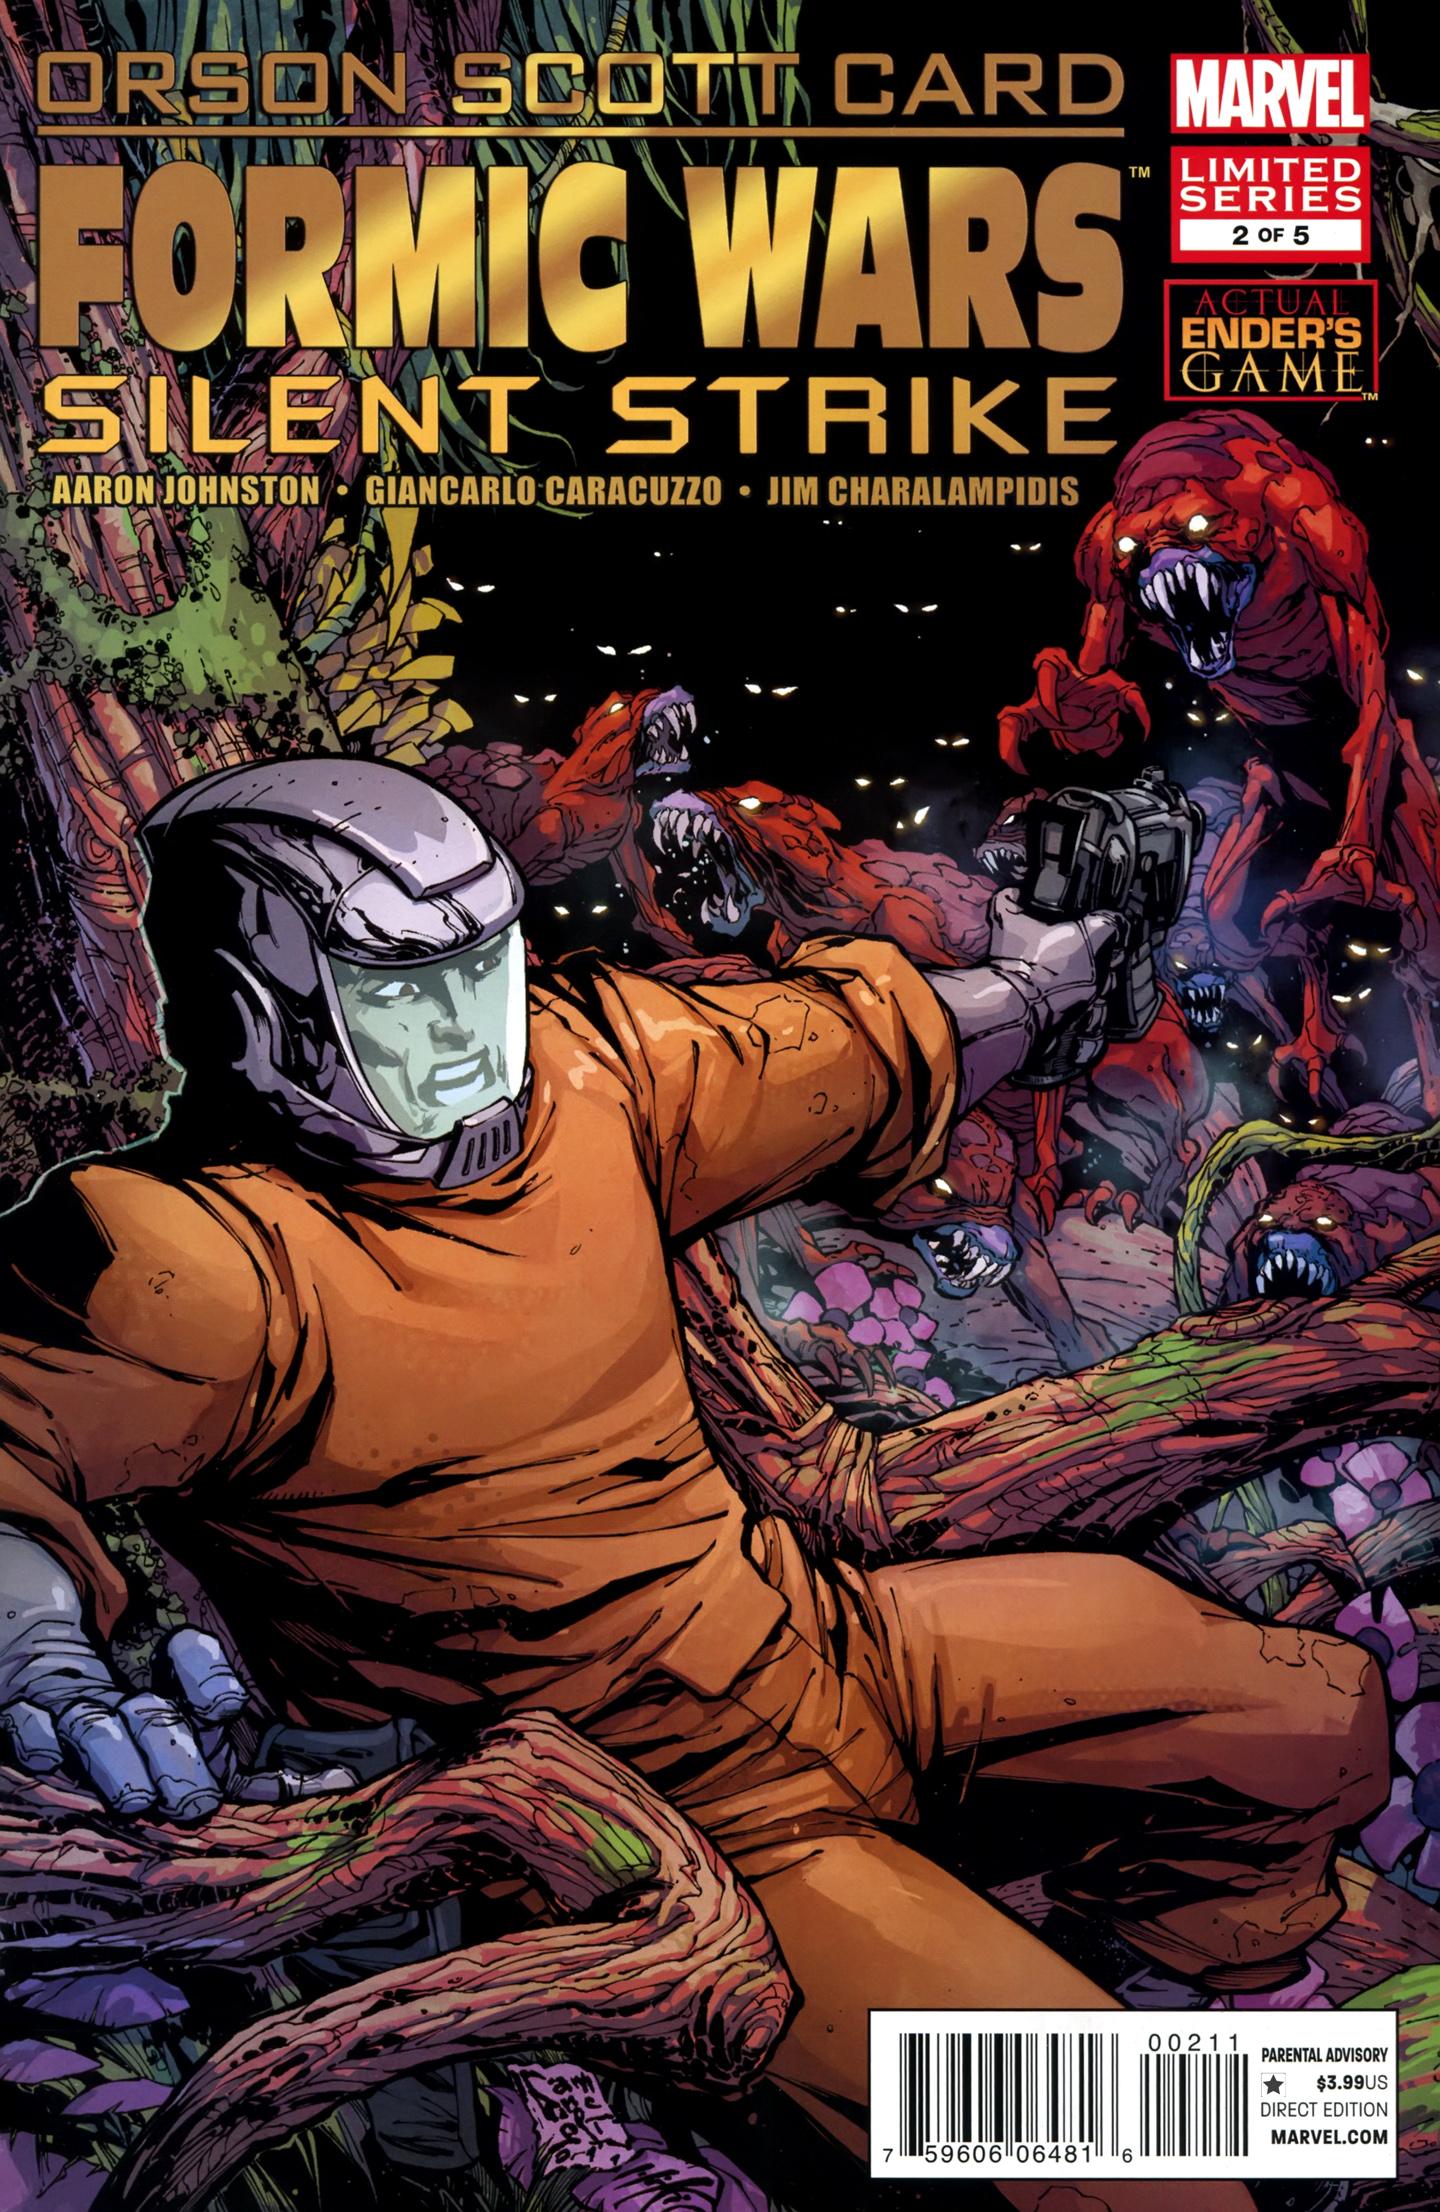 Formic Wars: Silent Strike Vol 1 2